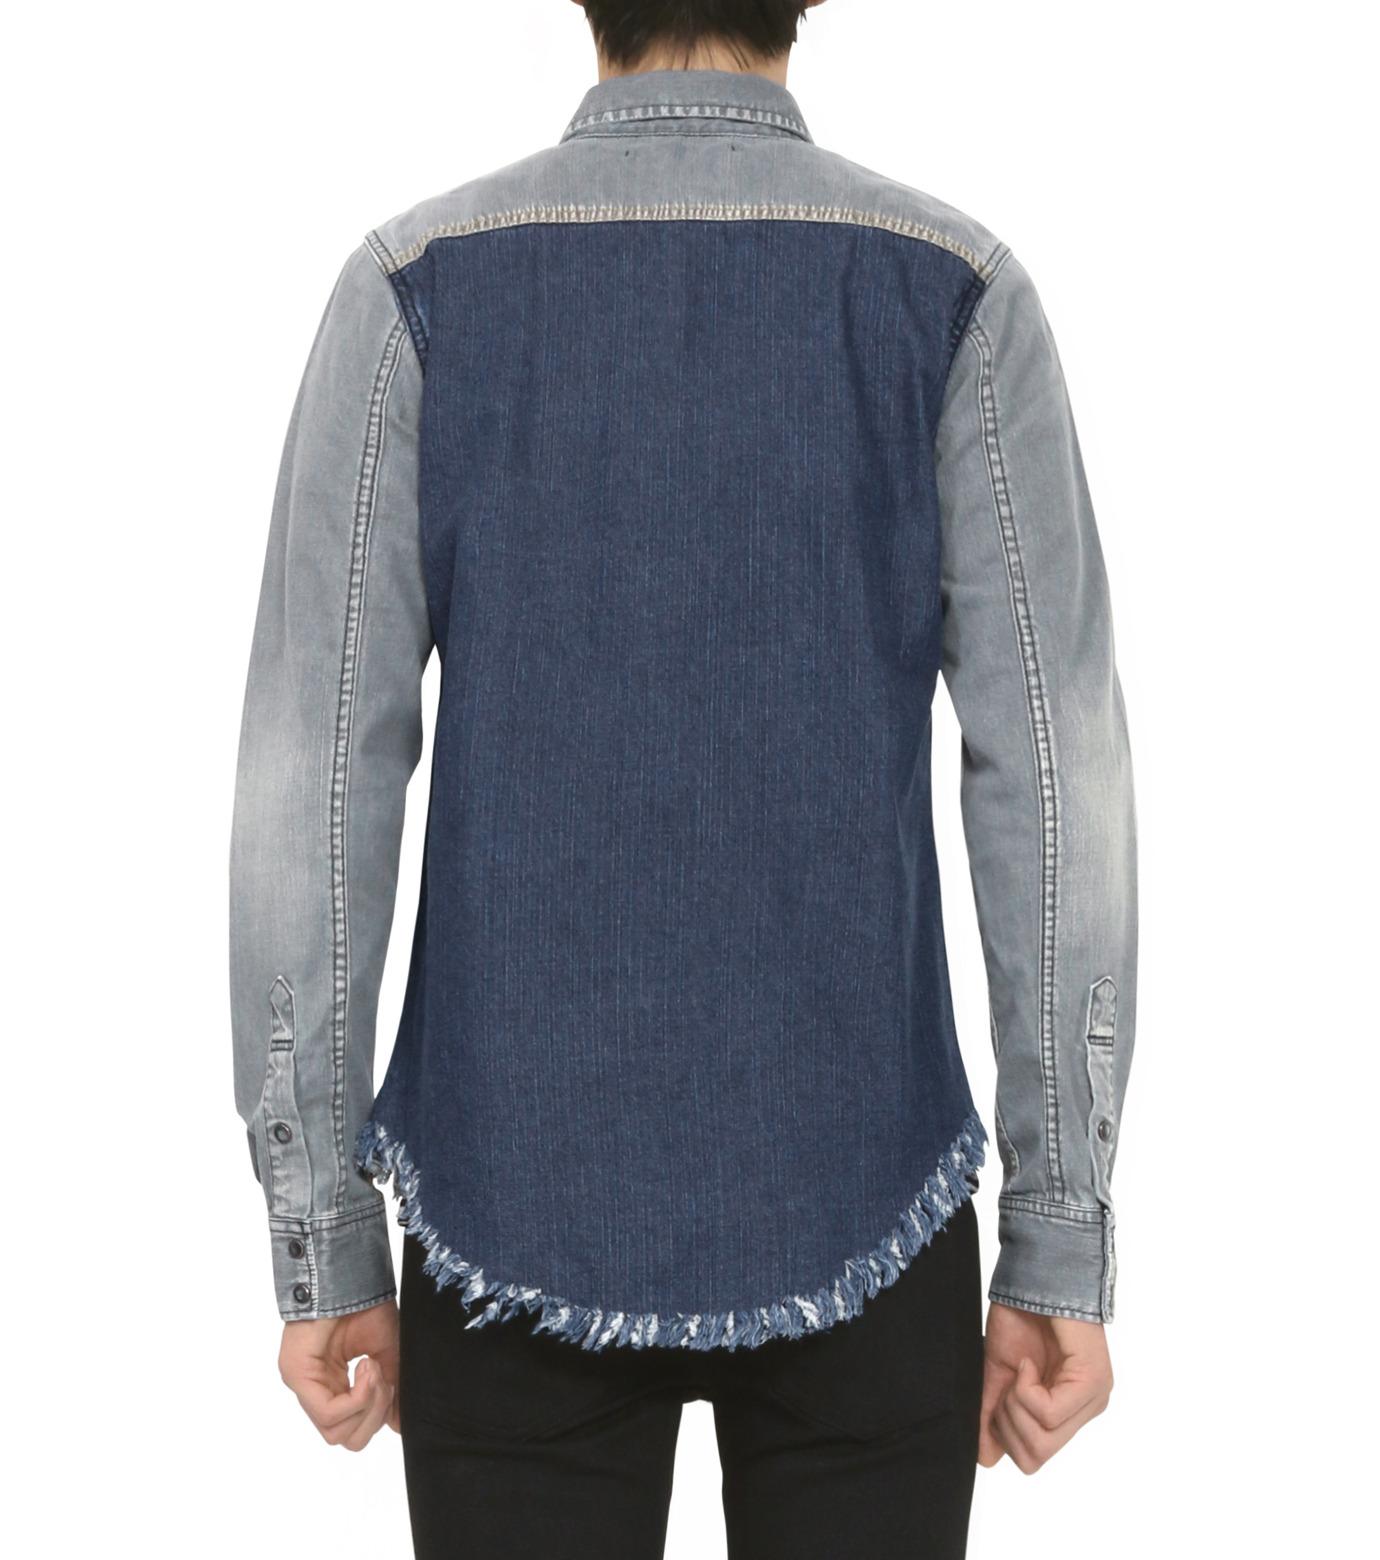 HL HEDDIE LOVU(エイチエル・エディールーヴ)のBK DENIM WASH SHIRT-GRAY(シャツ/shirt)-18S93004-11 拡大詳細画像4